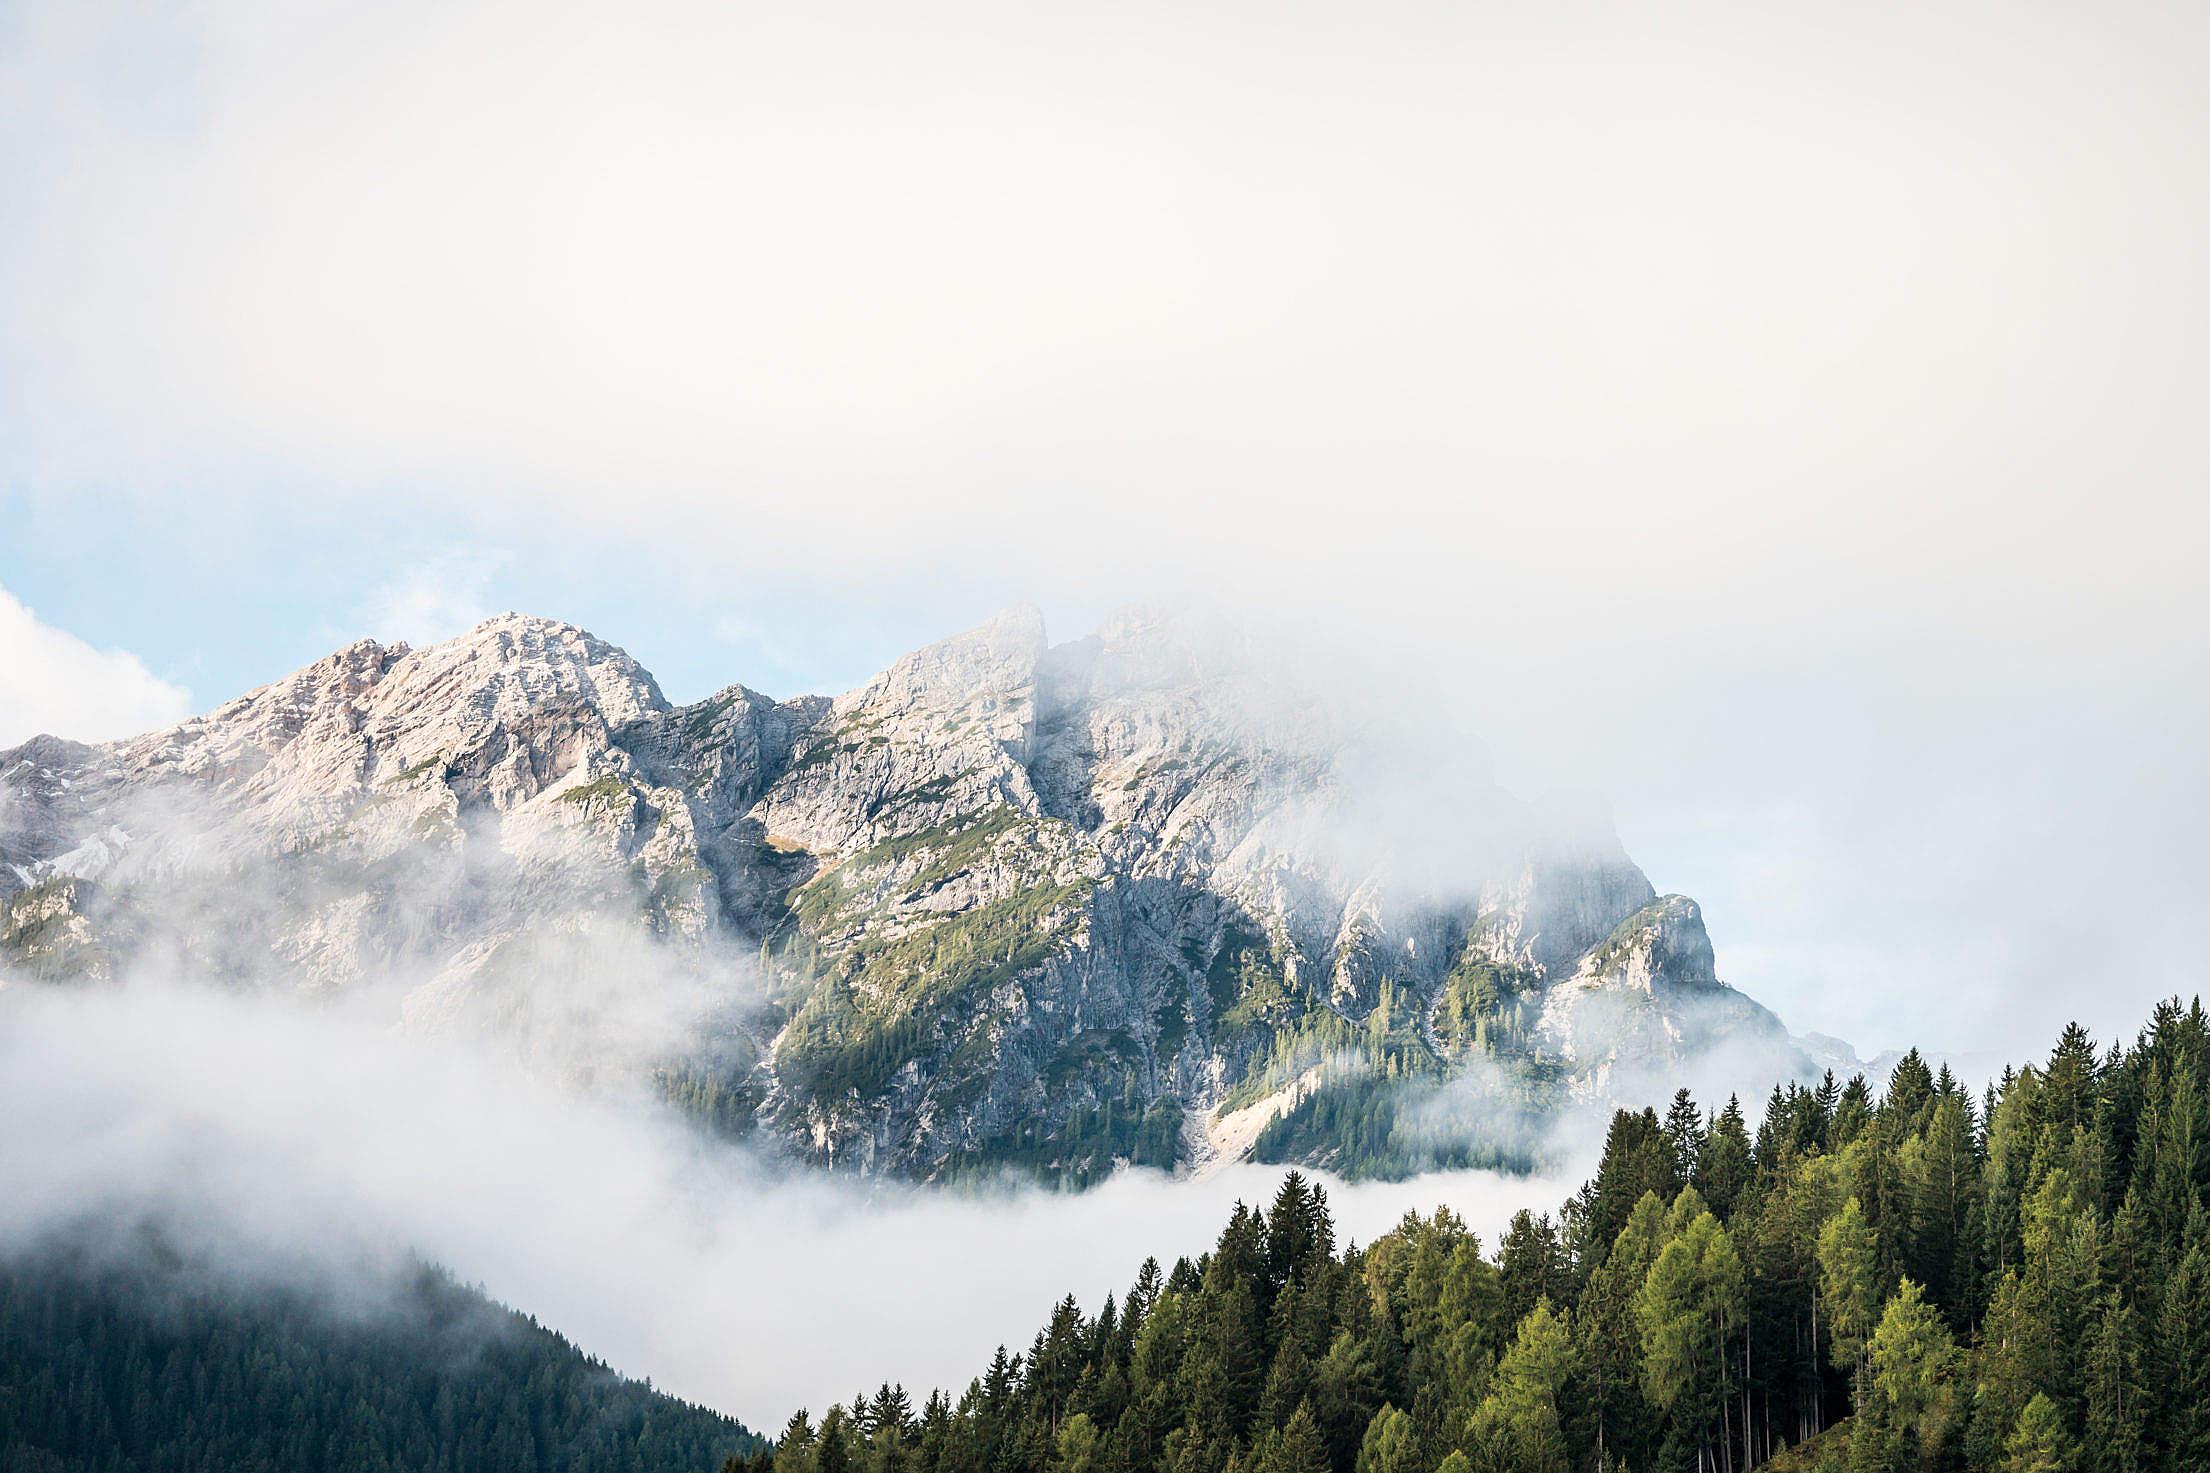 Beautiful Mountain in Cloudy Morning Free Stock Photo